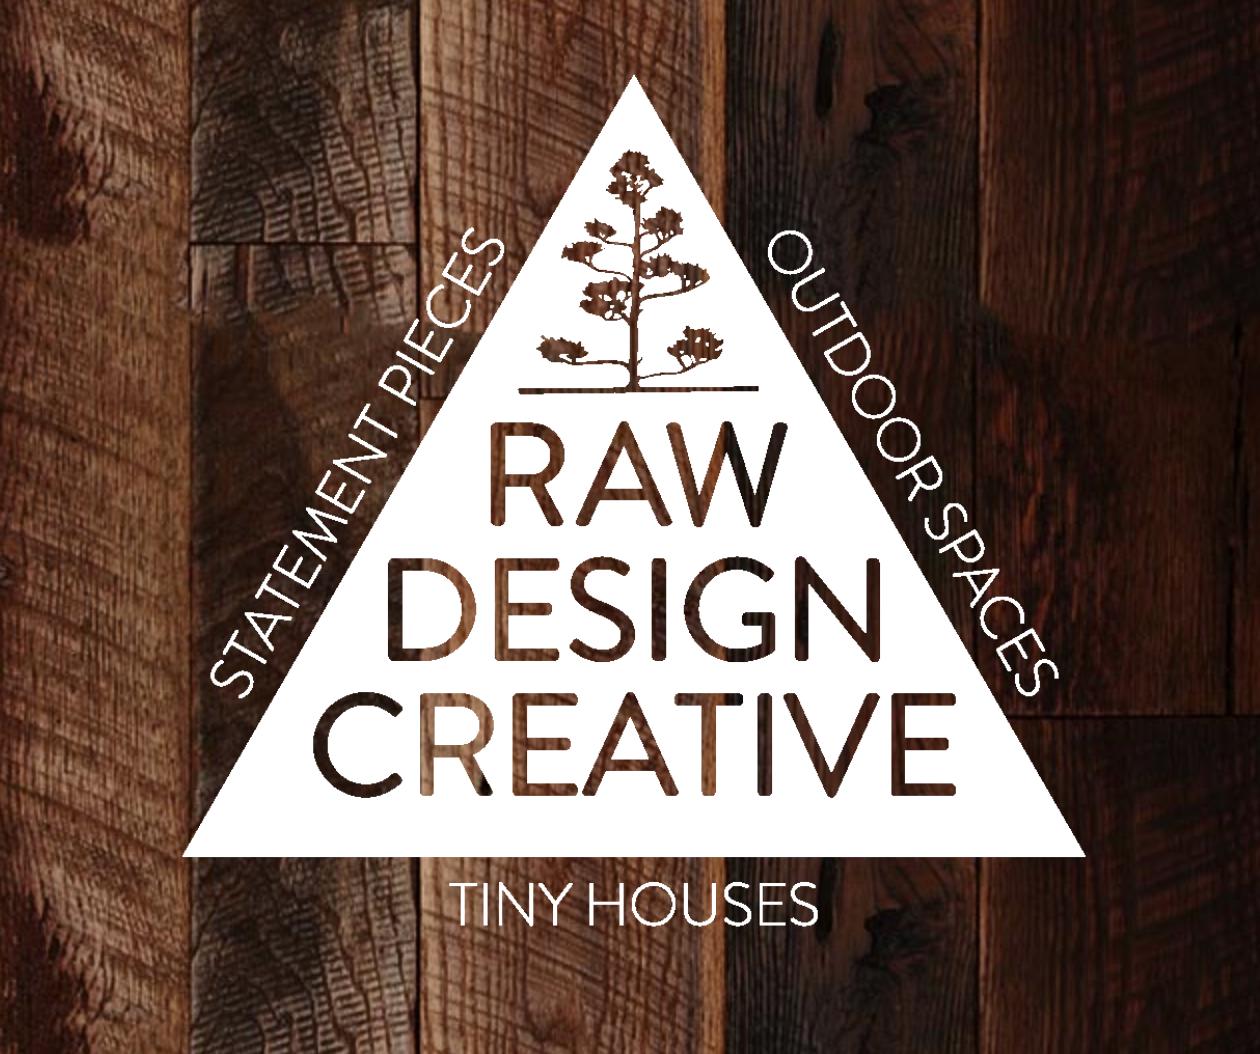 rawdesigncreative-logo-1